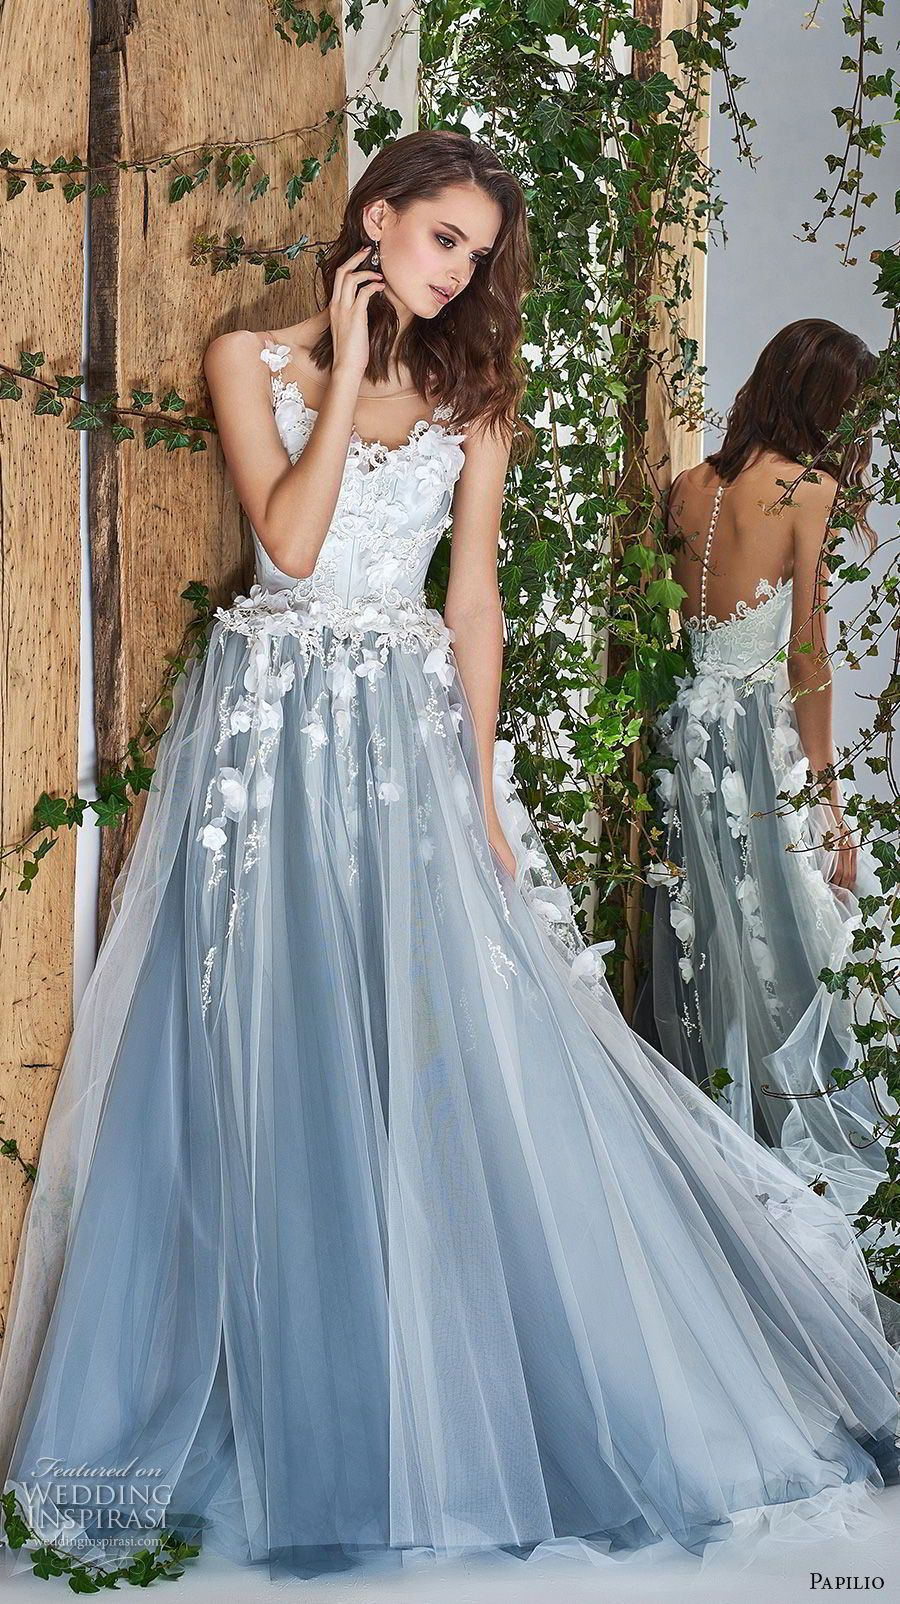 Papilio wedding dresses u ucwonderlandud bridal collection